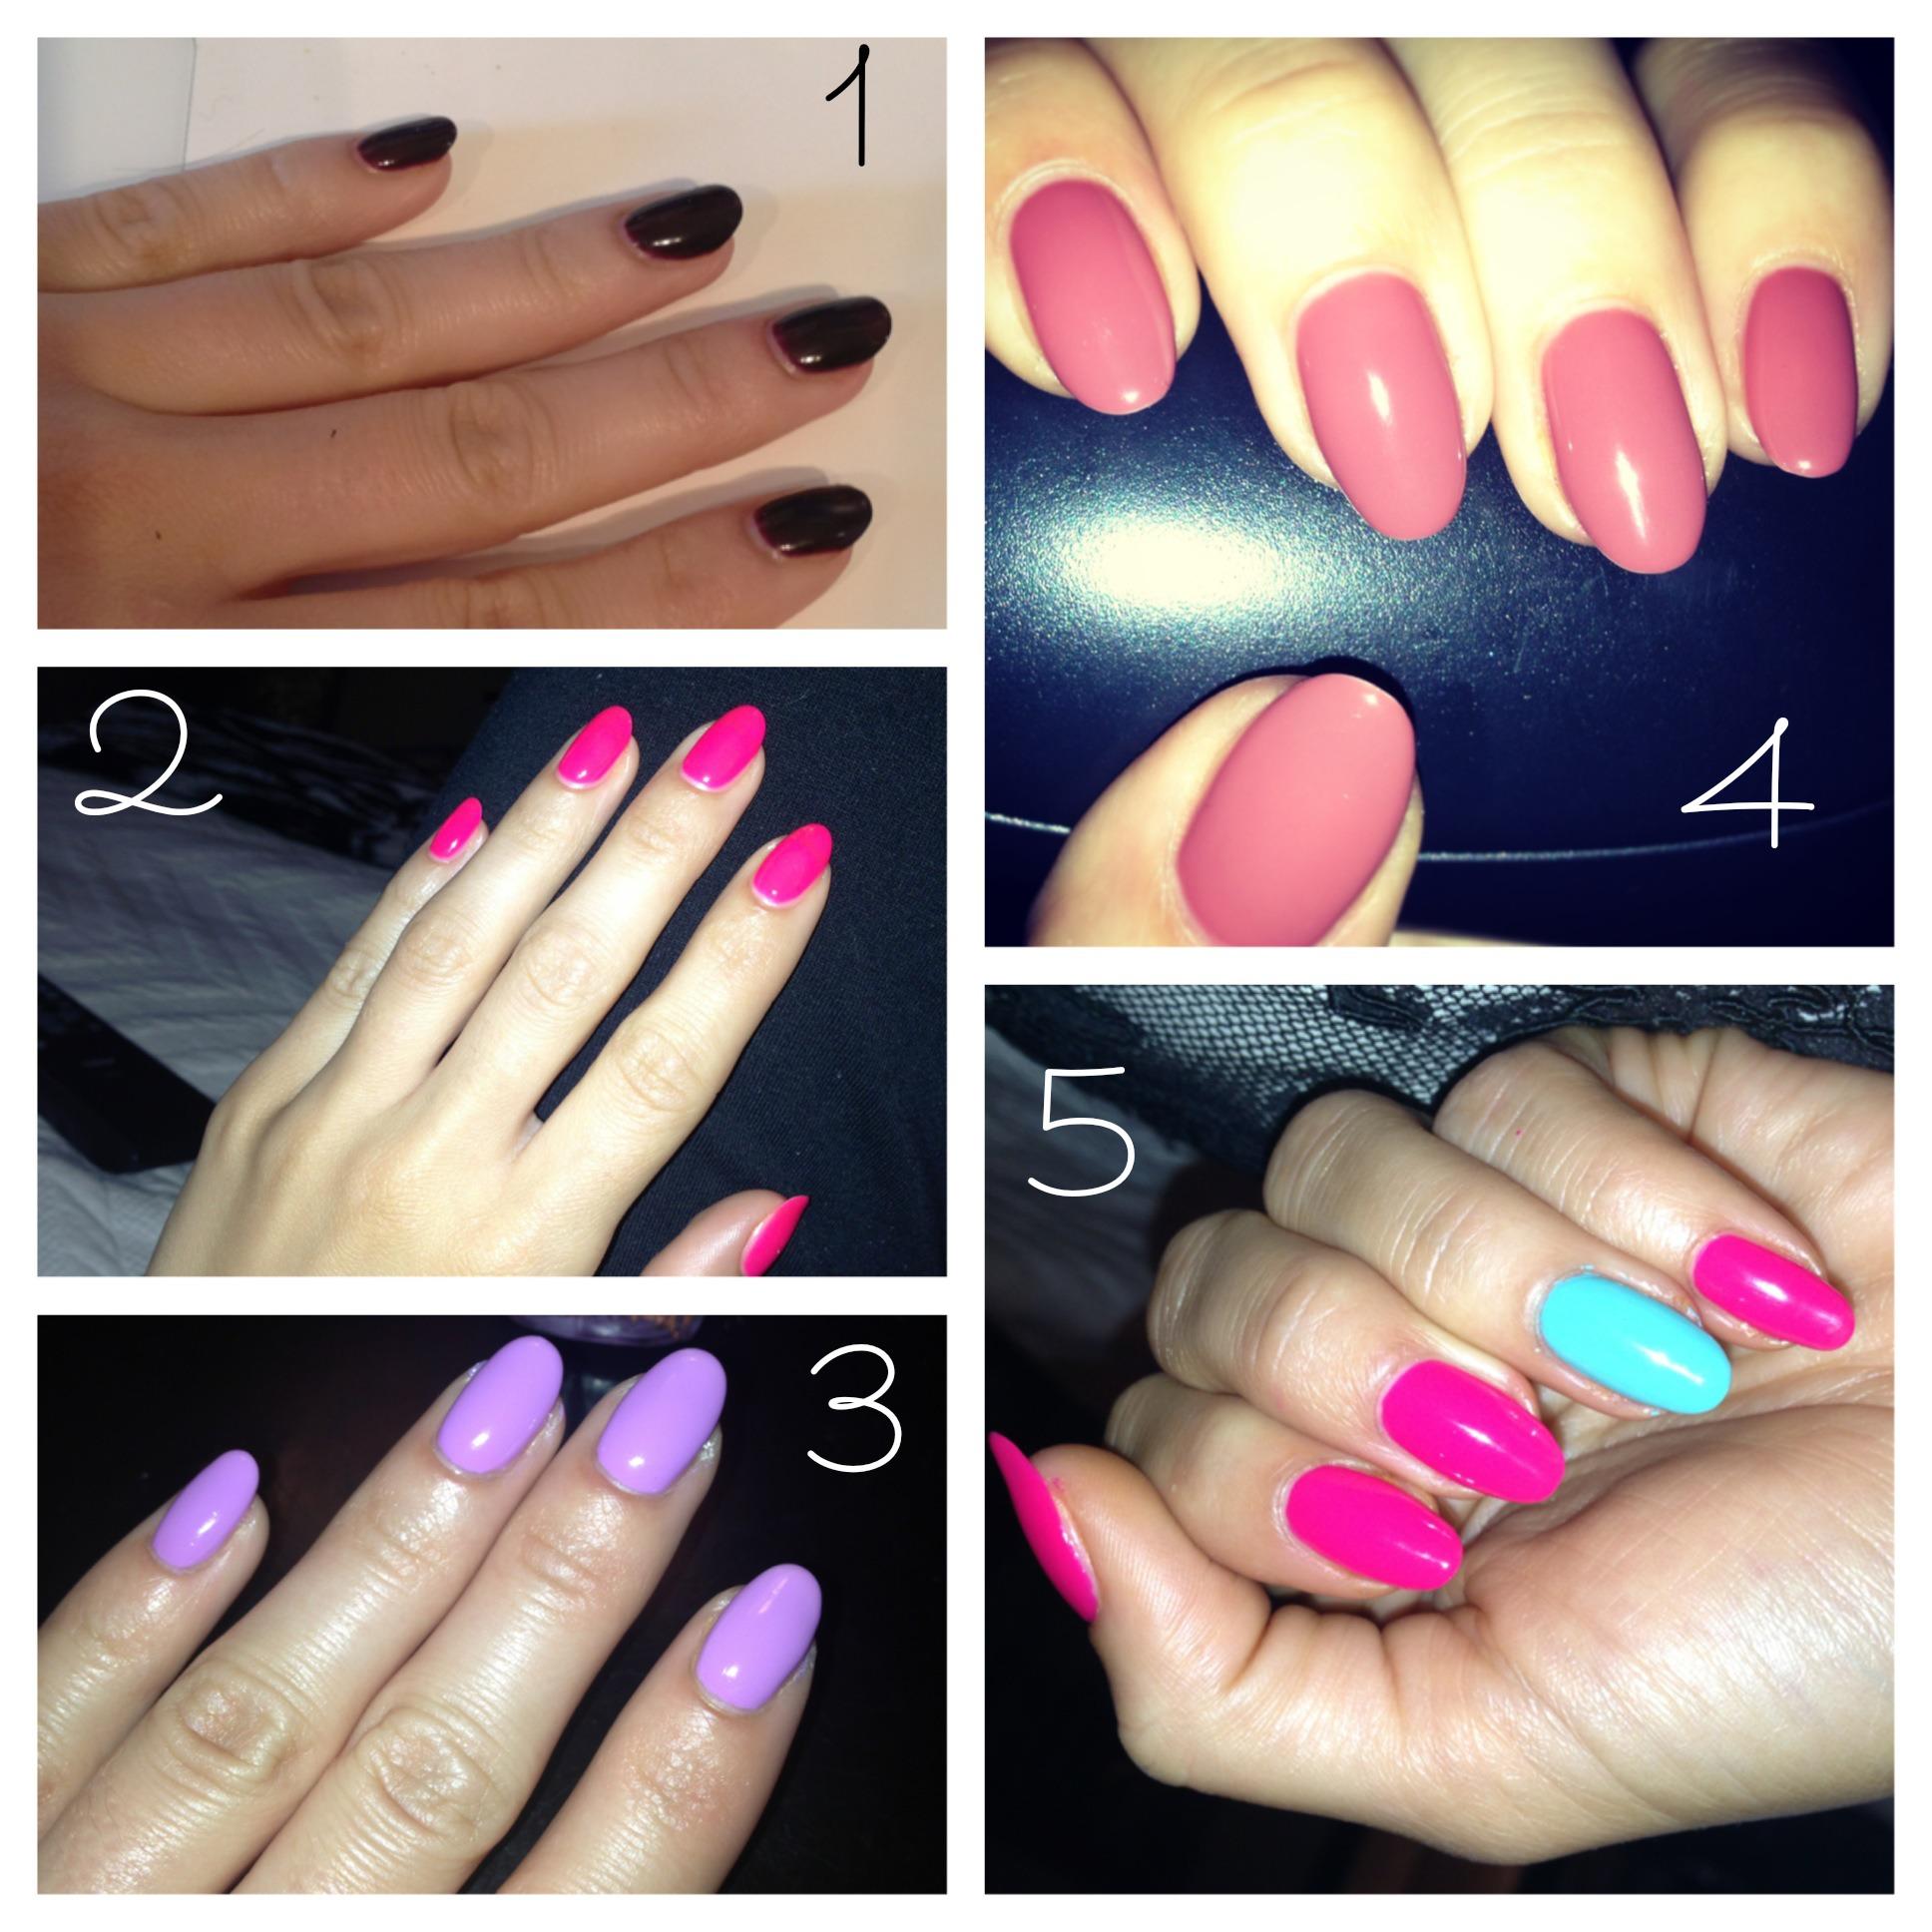 Mani Trends: Almond-Shaped Nails – Amanda Bella